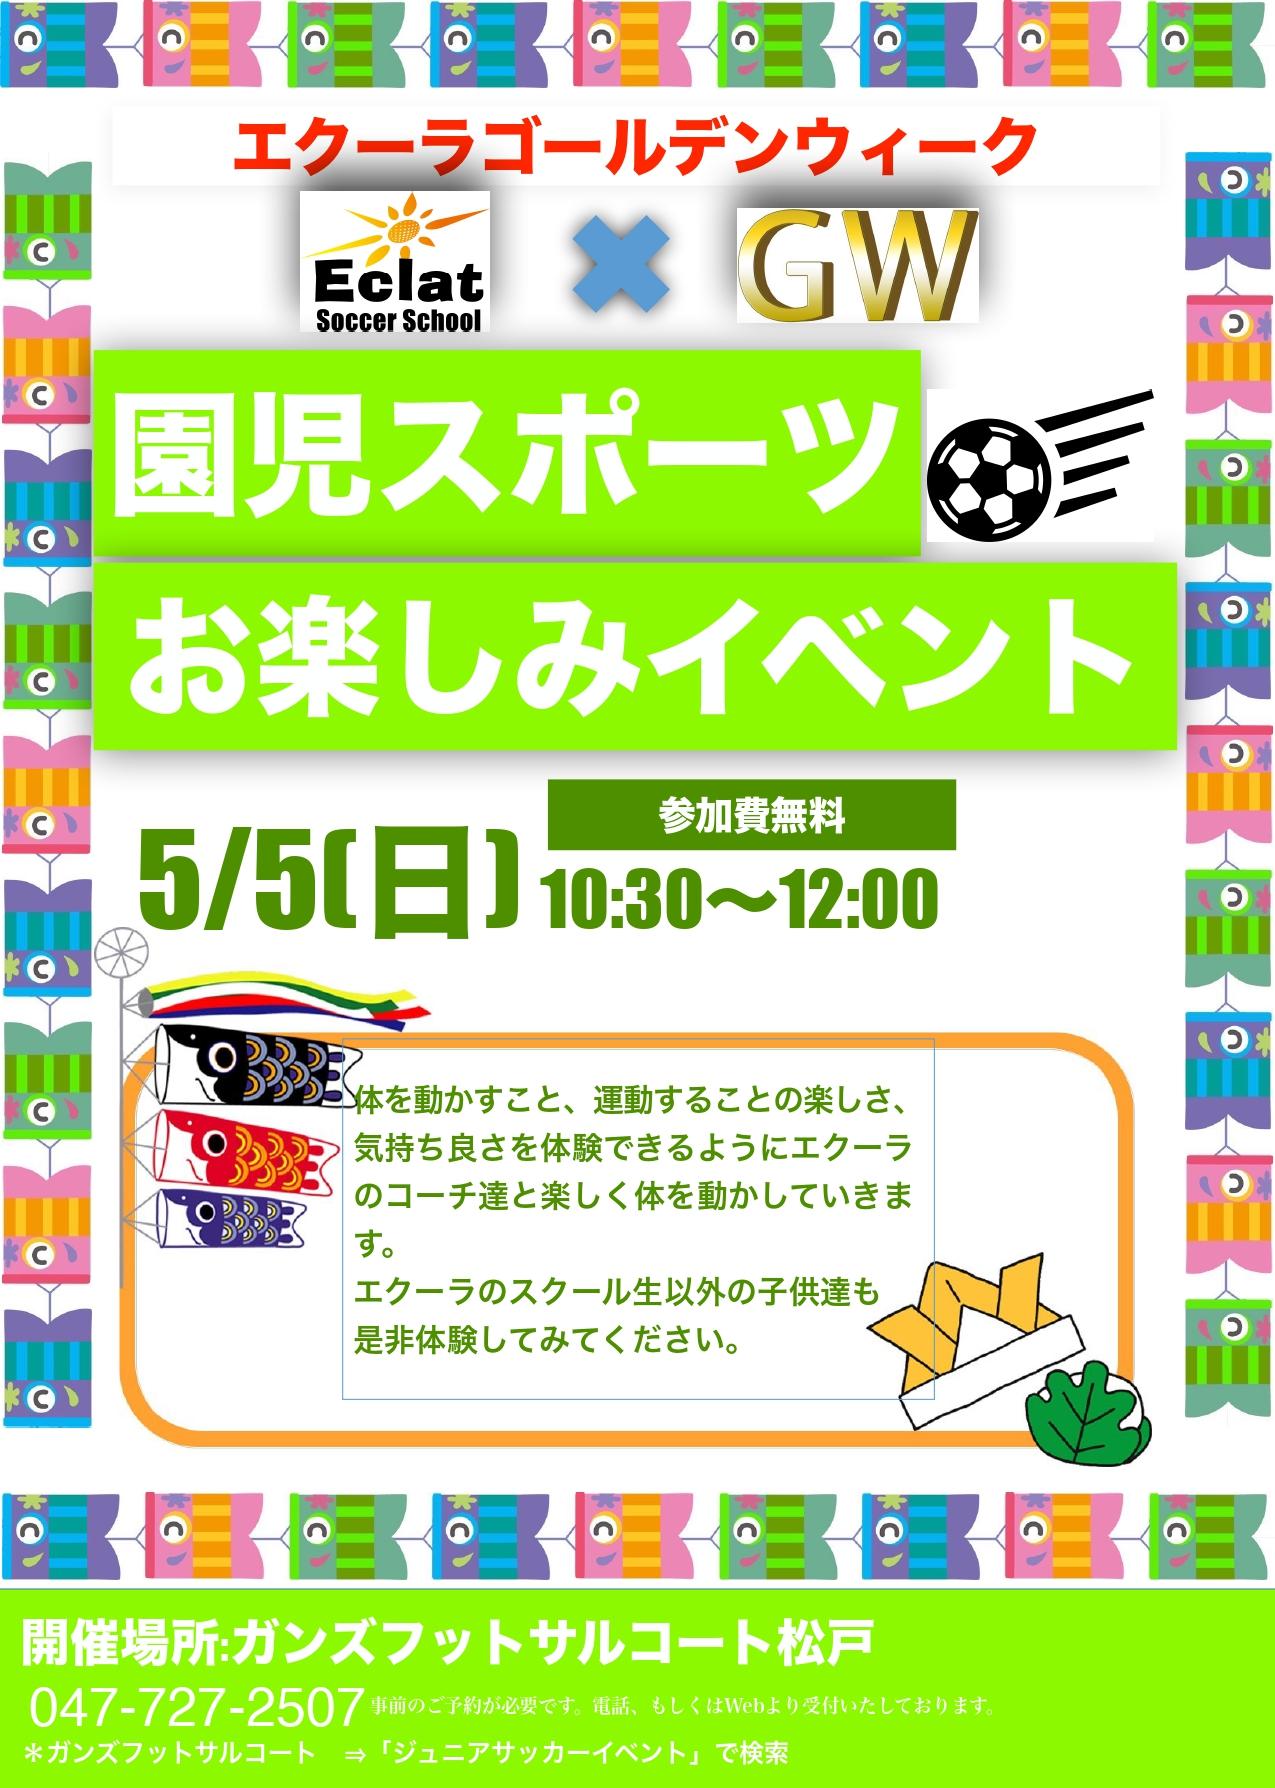 『GW企画第3弾』園児スポーツお楽しみイベント 5月5日(日)